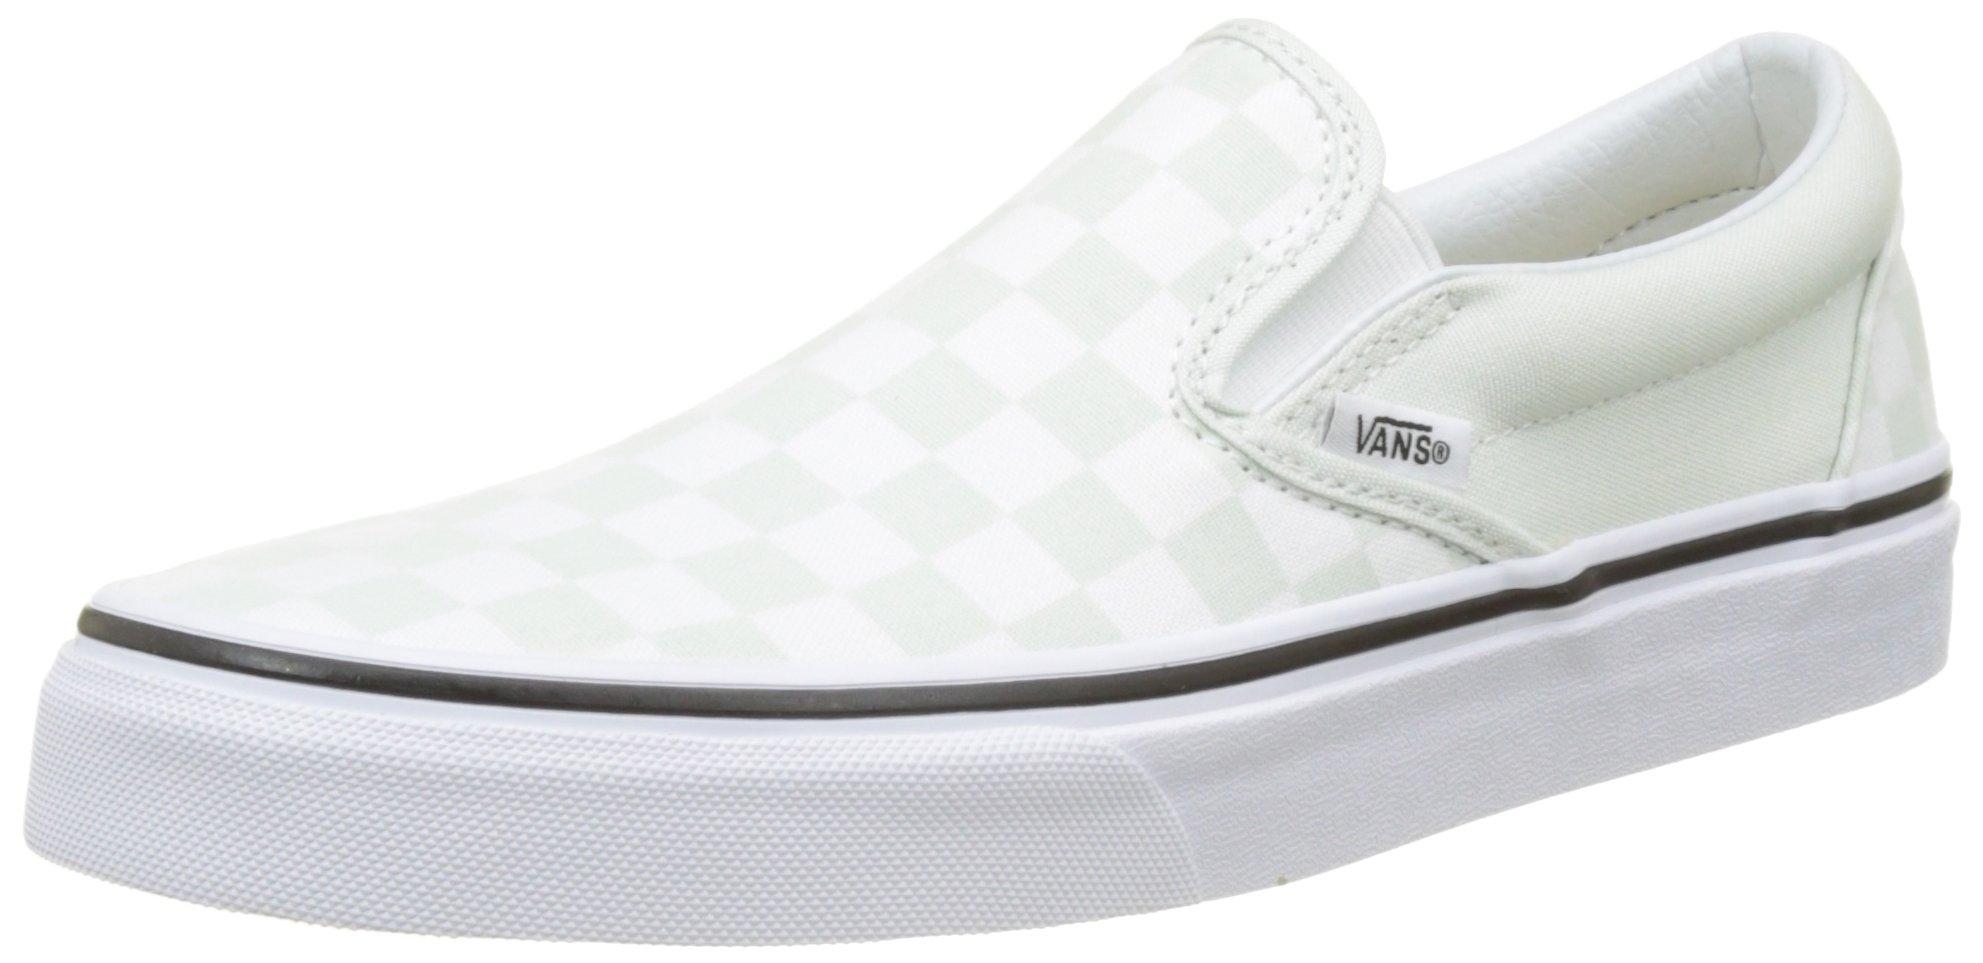 Vans Unisex Checkerboard Blue Flower/True White Slip-On - 7